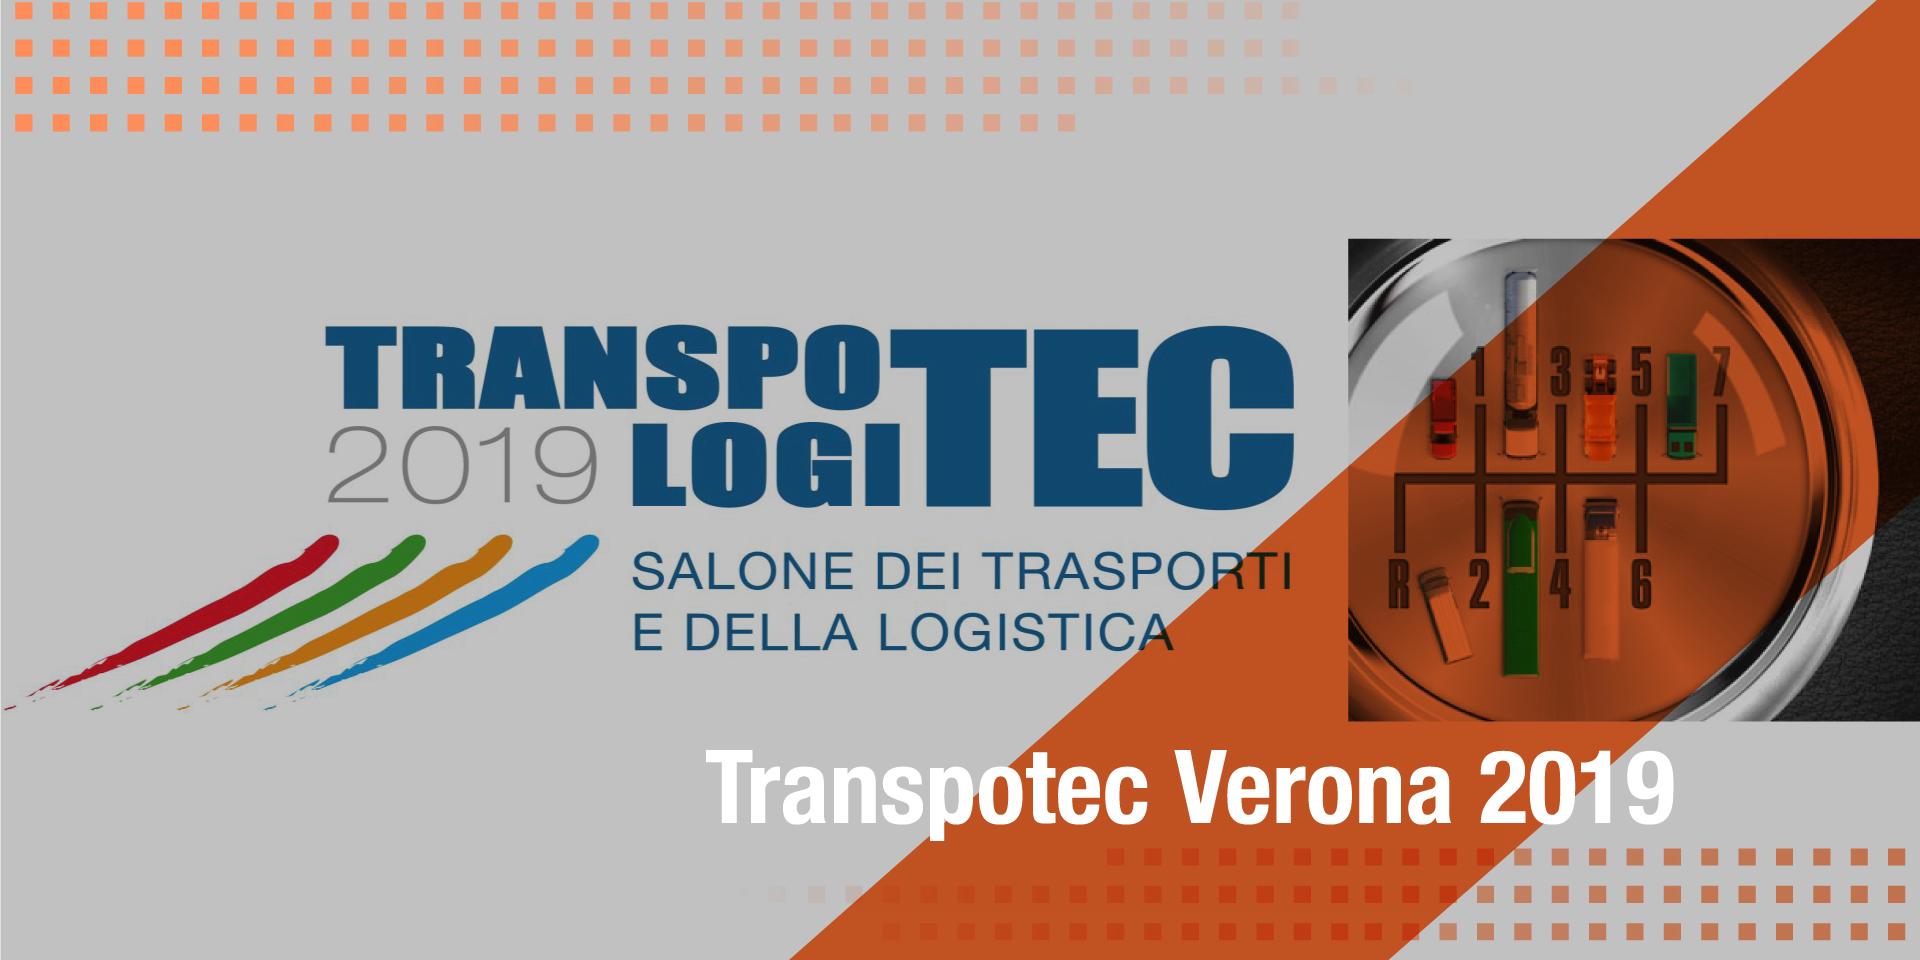 Transpotec Verona 2019